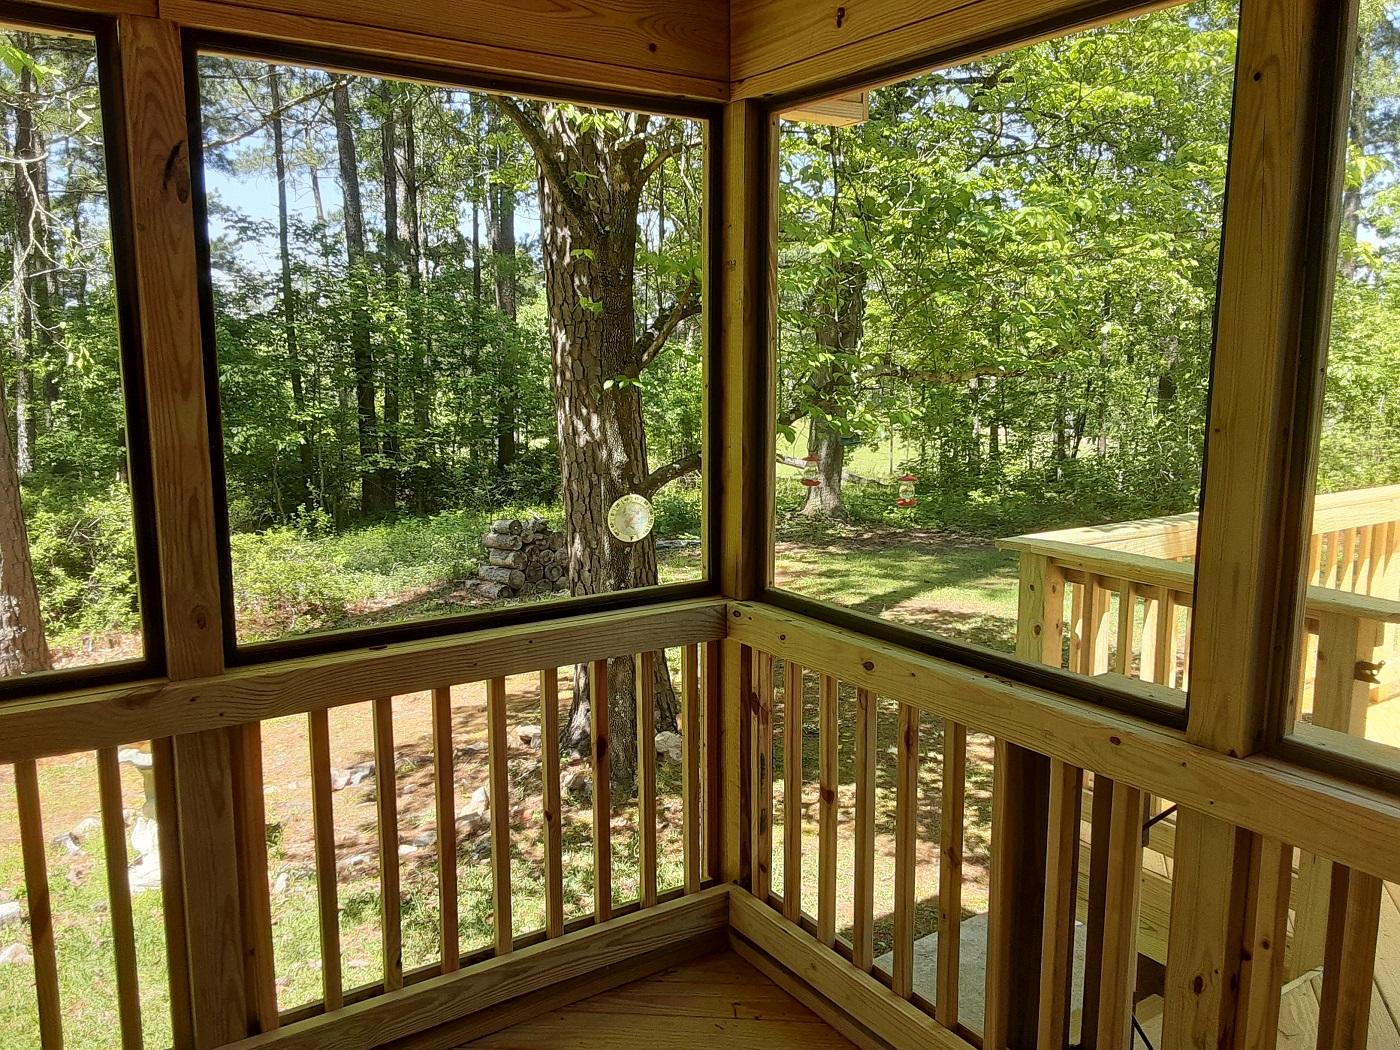 Interior-of-screened-porch